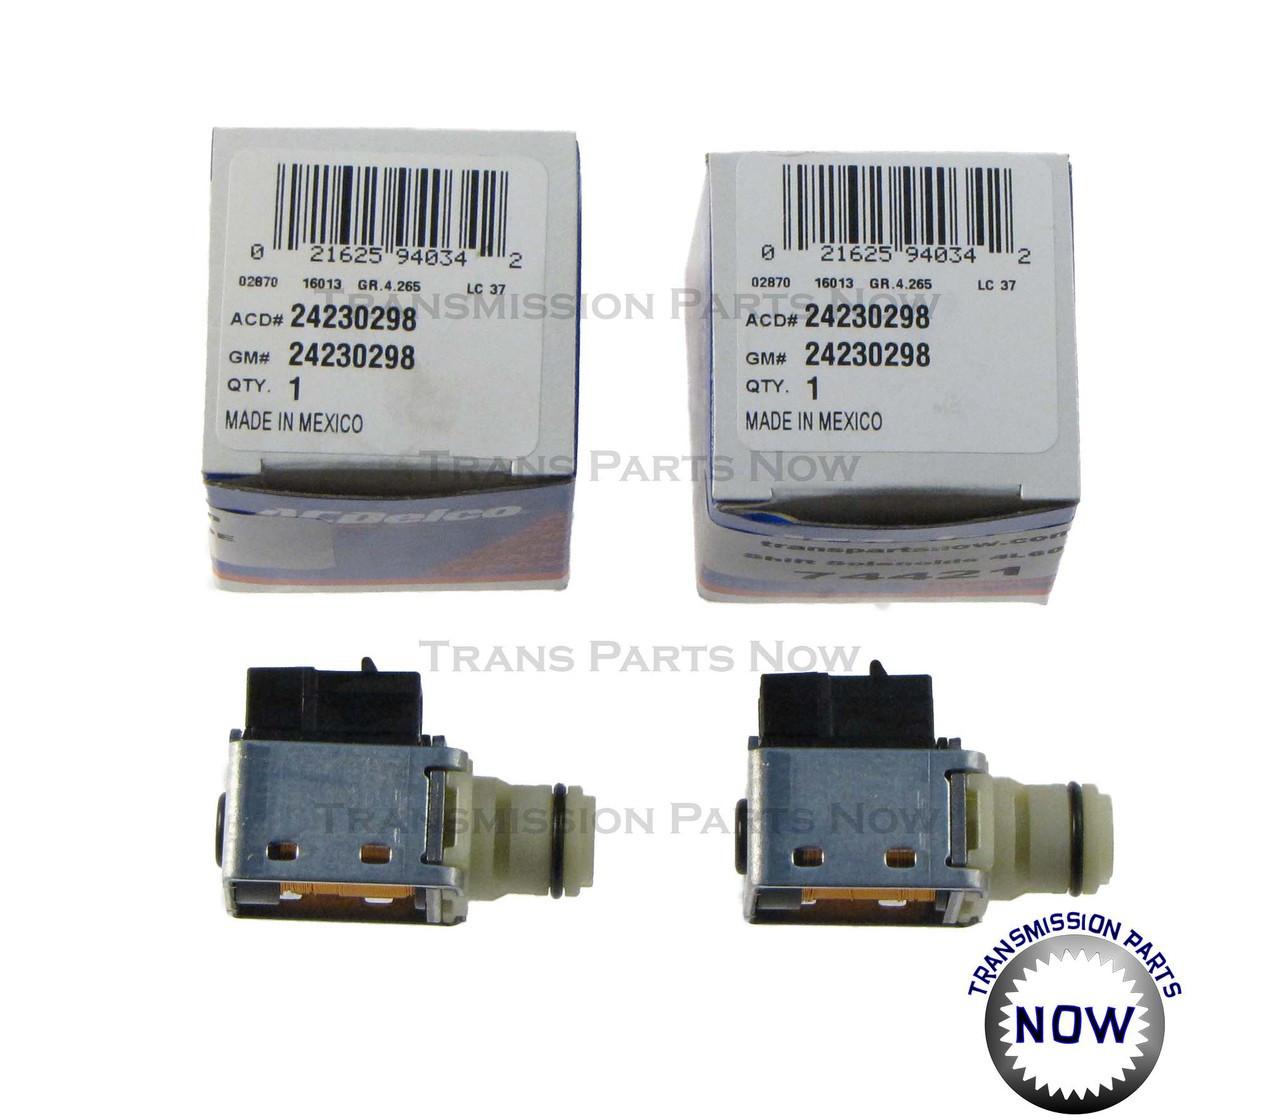 Ac Delco Shift Solenoid Kit 4l60e 4l65e 4l70e Gm Solenoids Transmission Parts